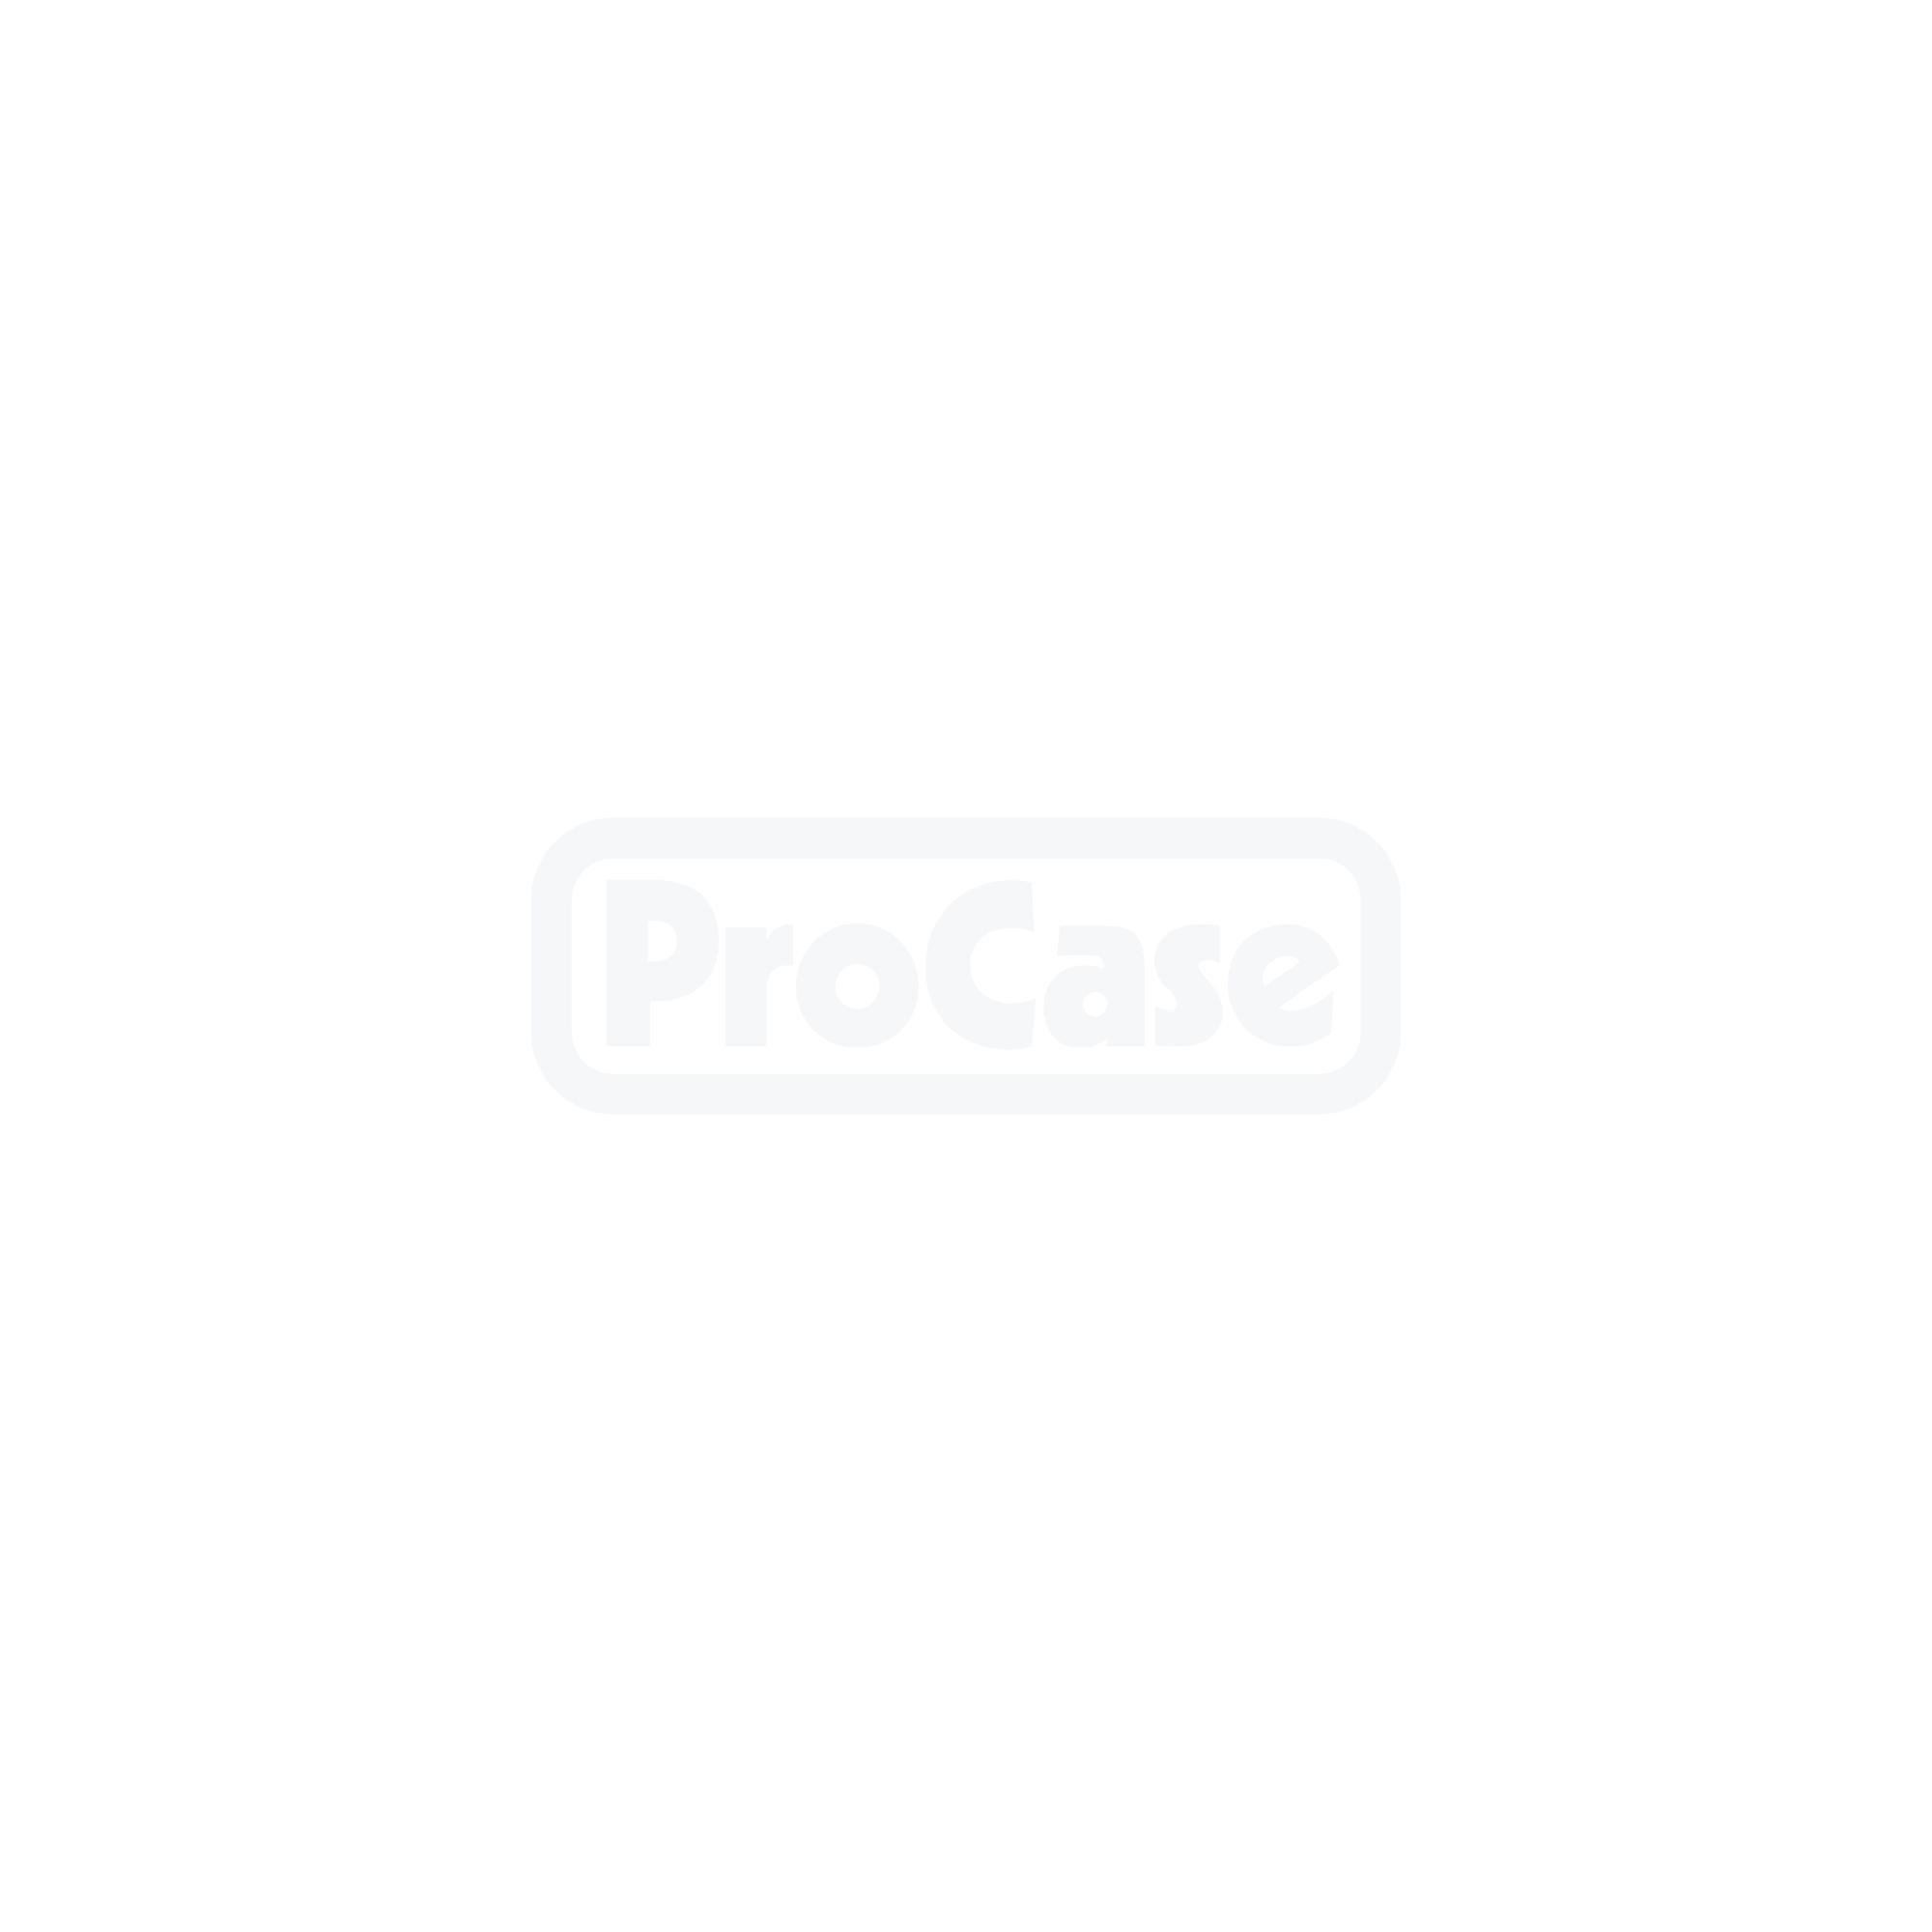 Flightcase für JB Lighting Varyscan P3 Spot & Wash